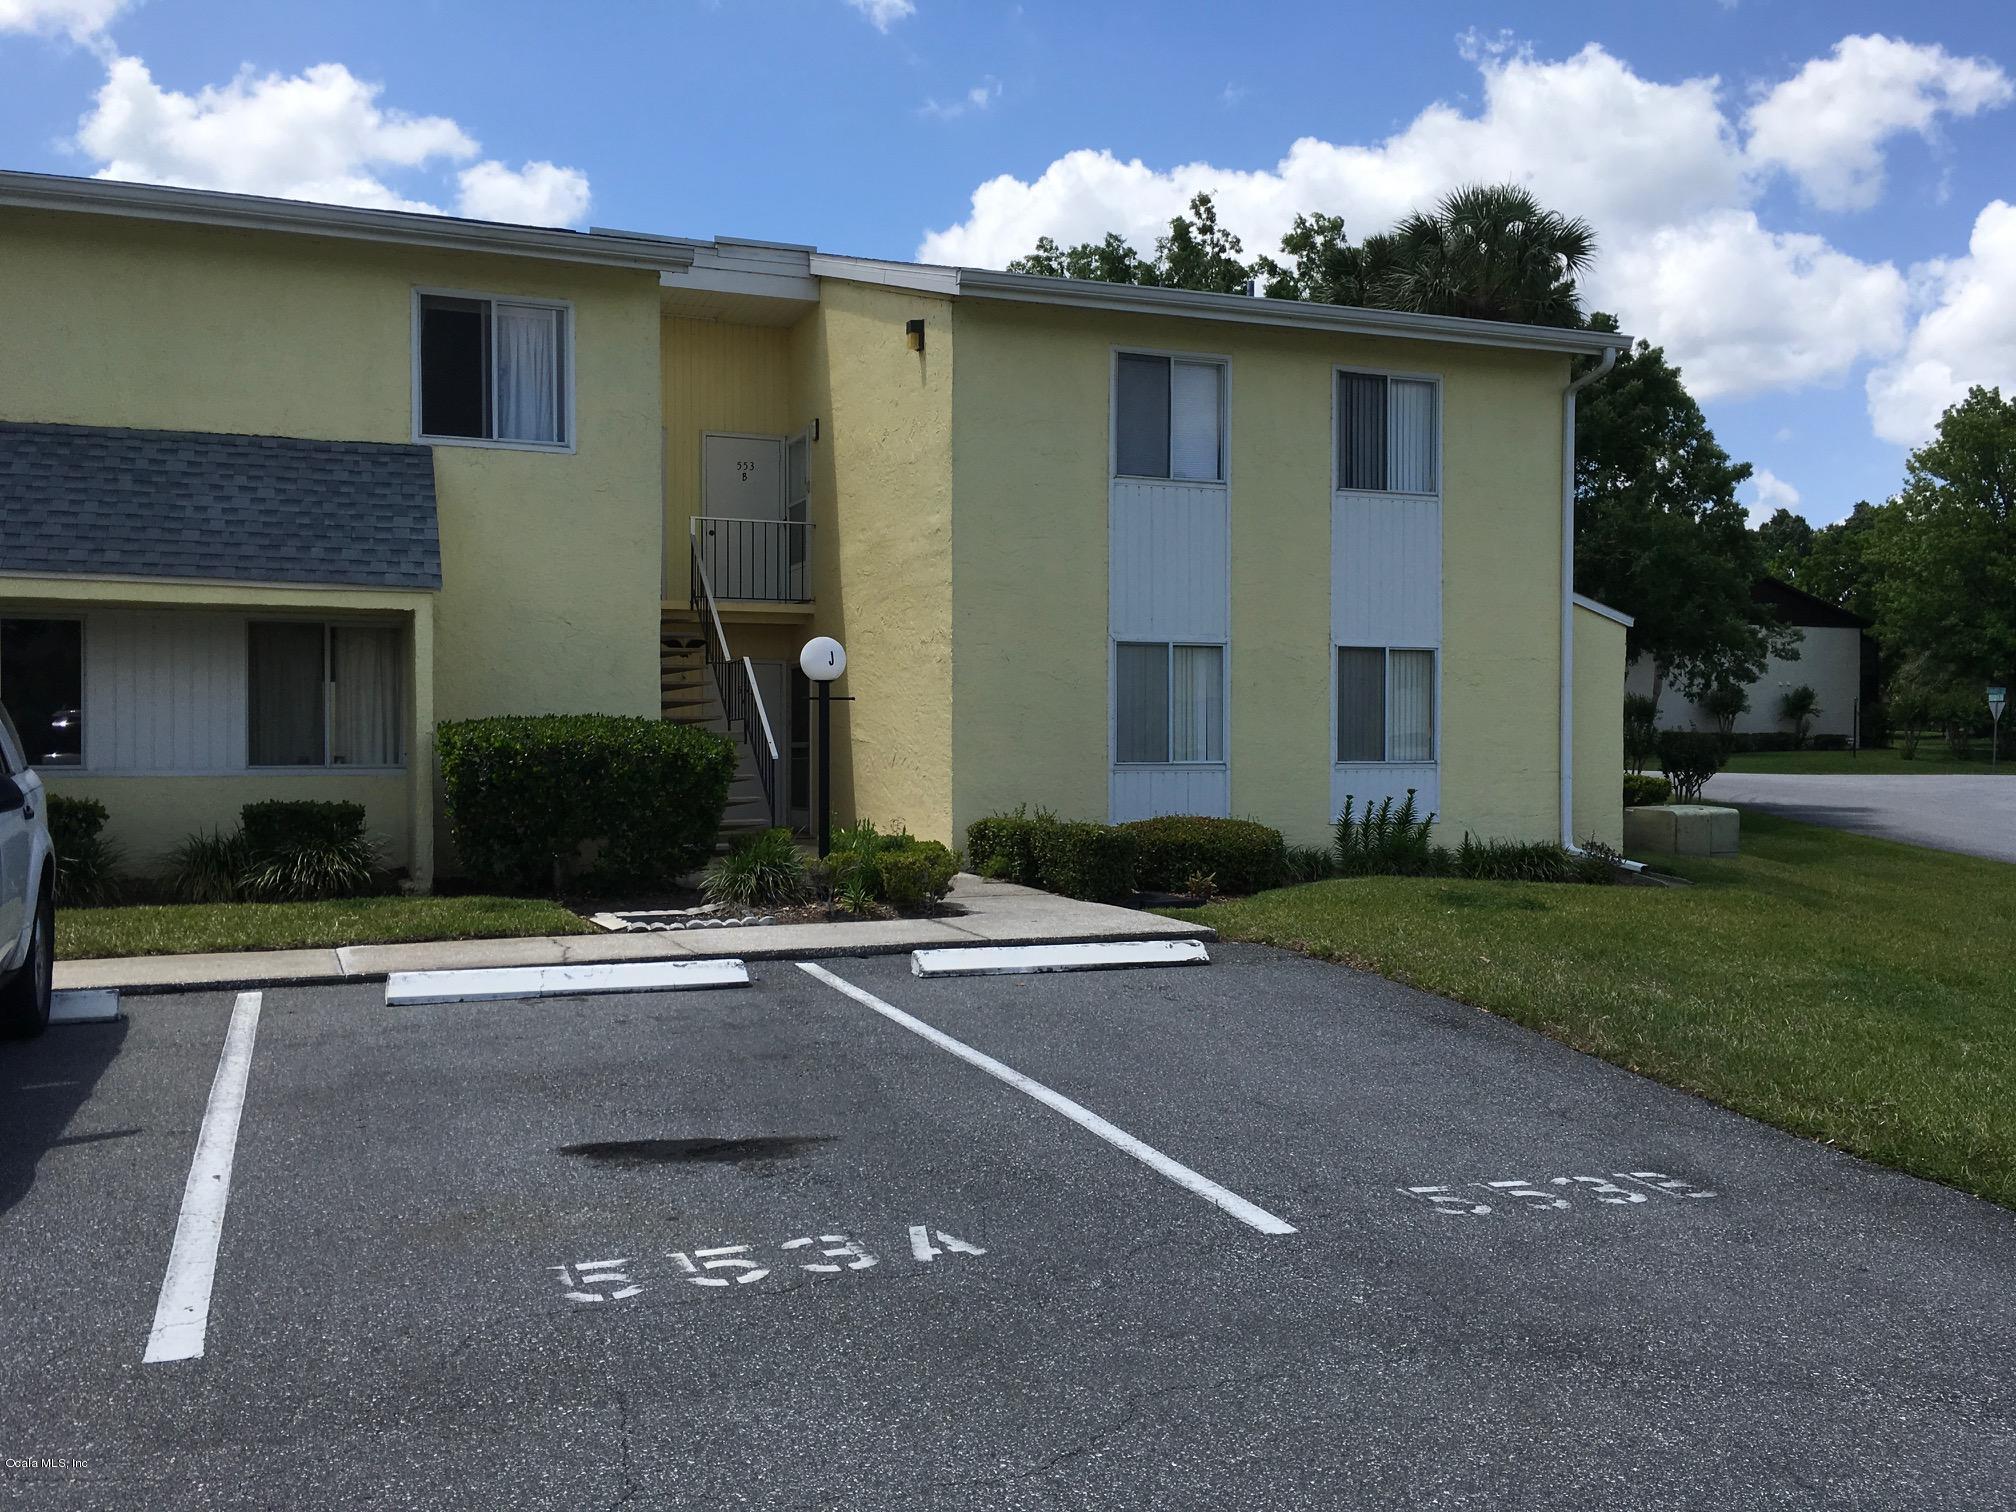 553 FAIRWAYS CIRCLE CIRCLE, OCALA, FL 34472